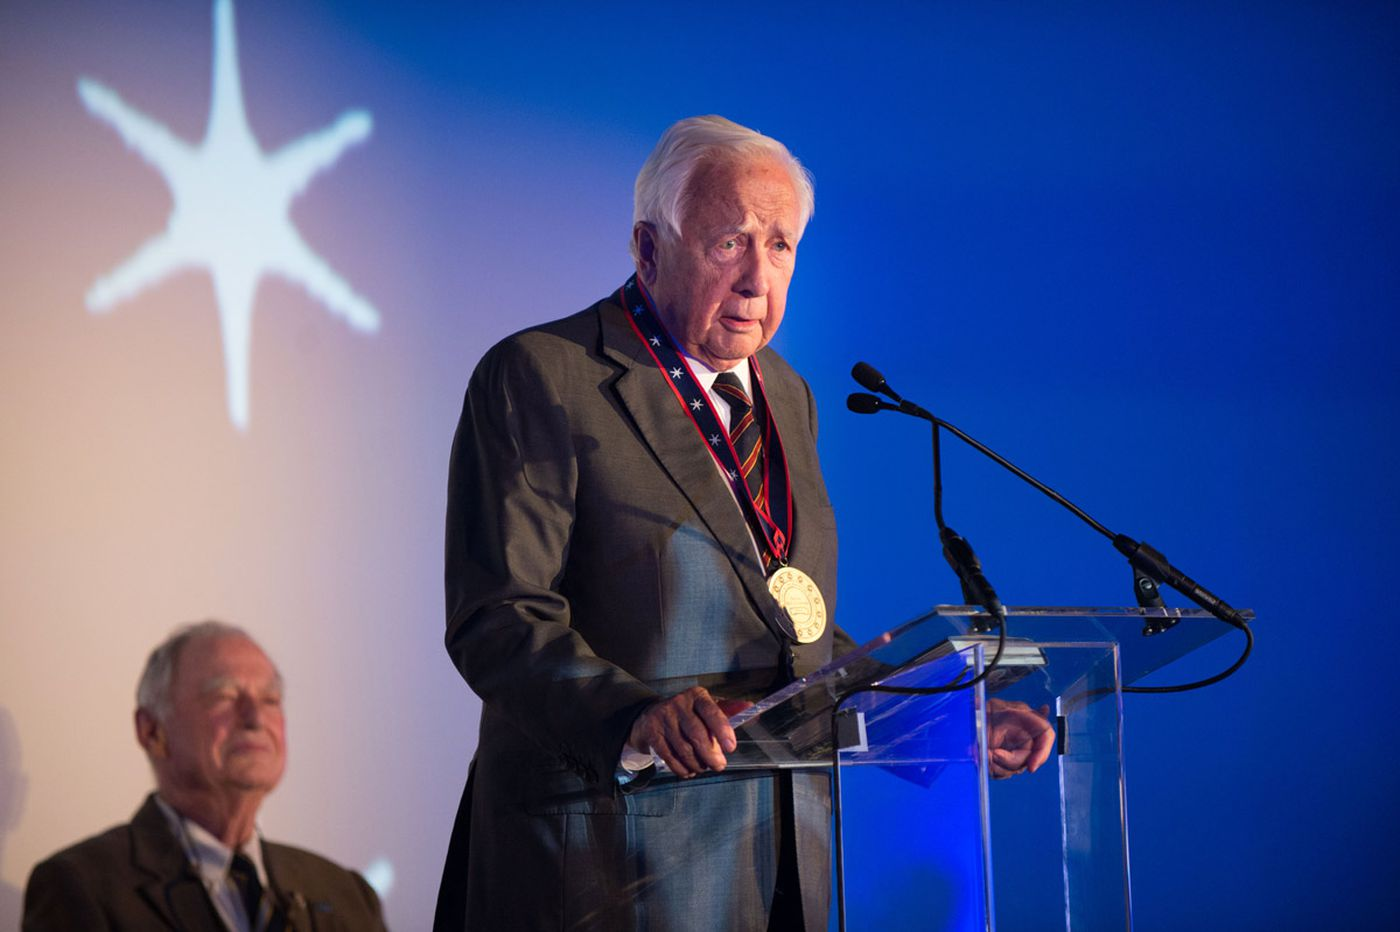 David McCullough receives inaugural Lenfest award